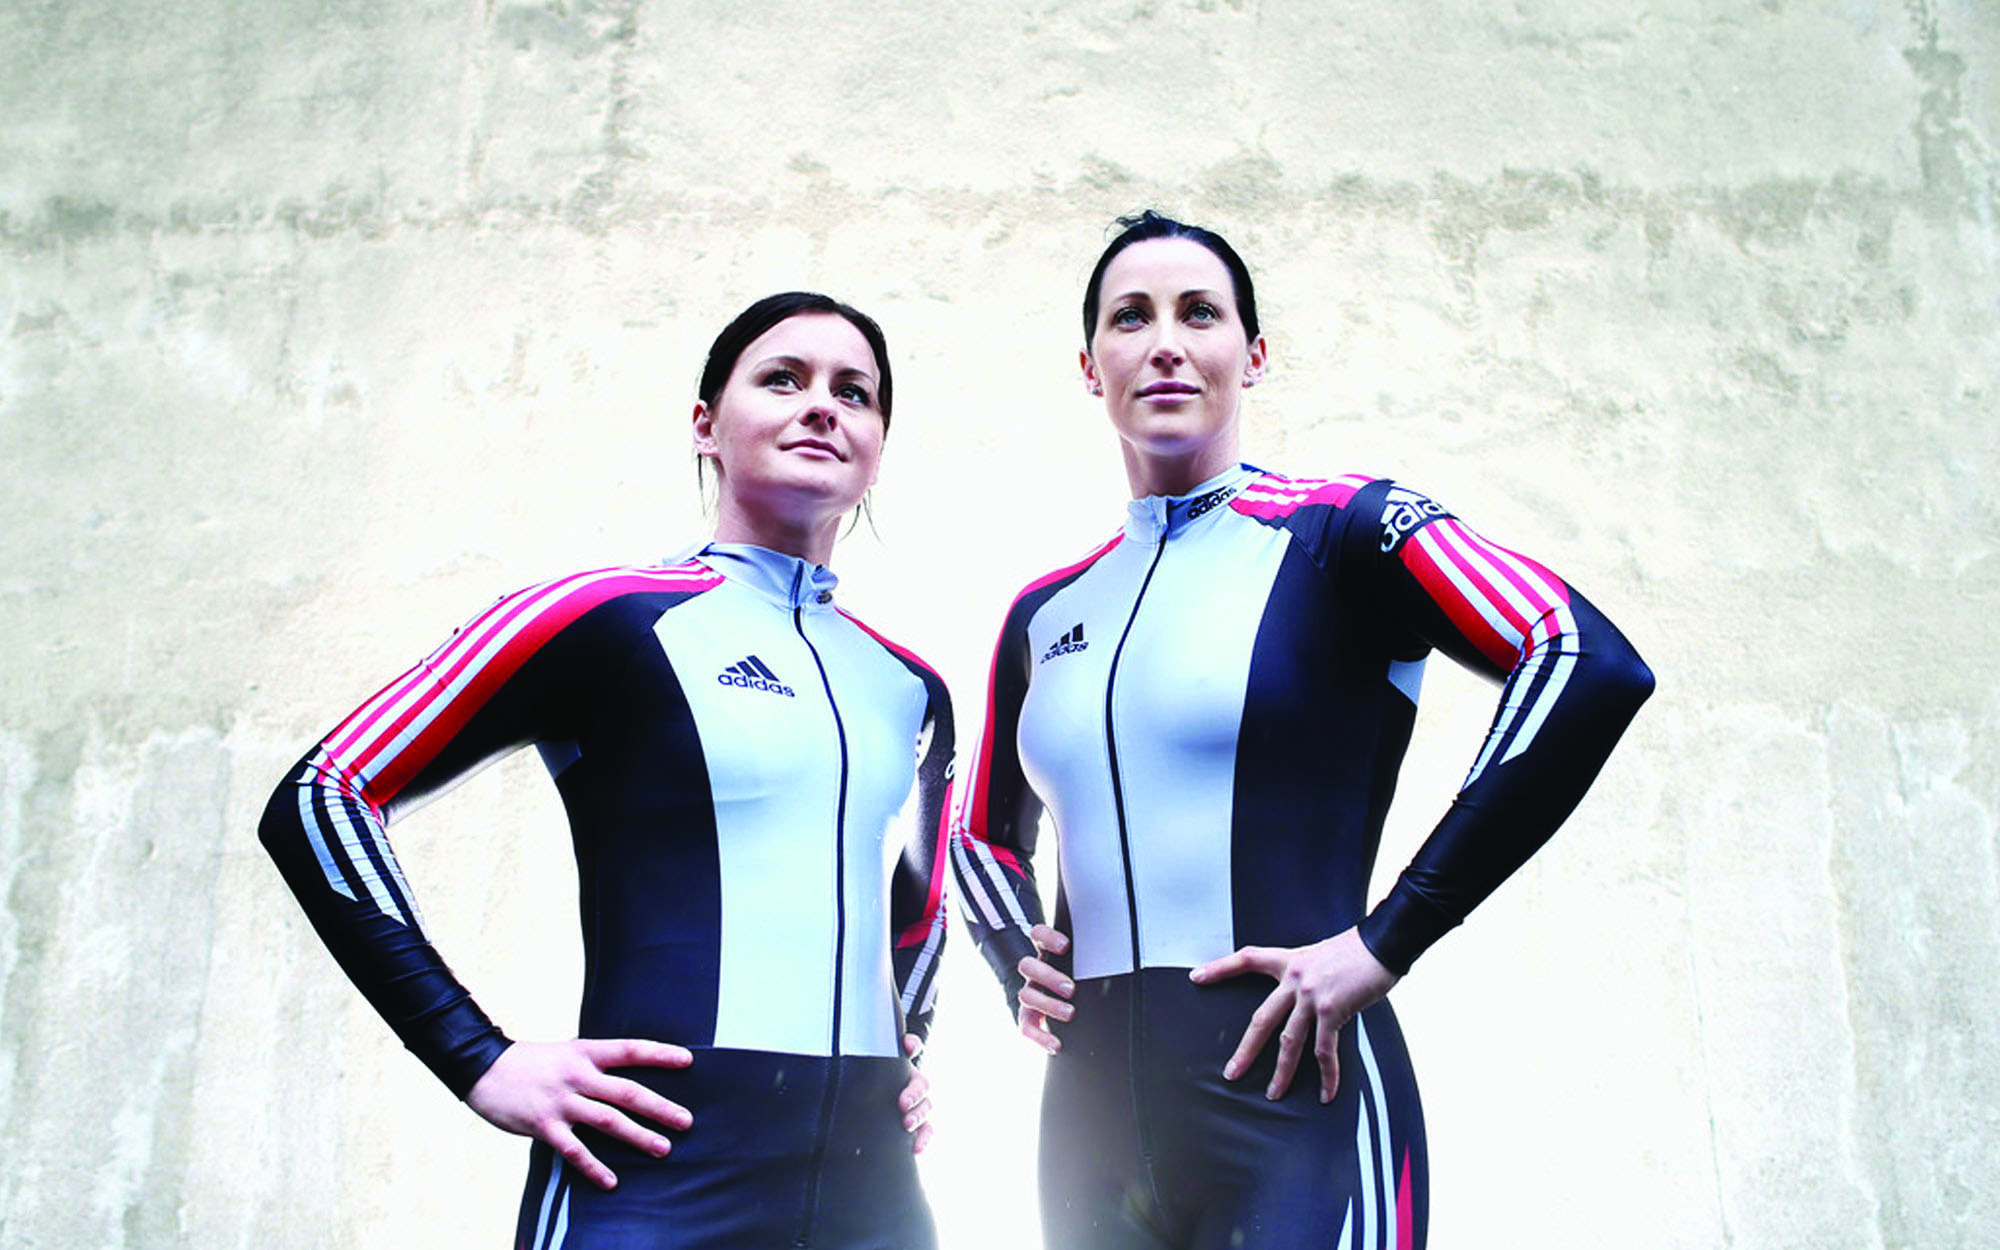 Shooting bobsleigh stars take aim at Sochi